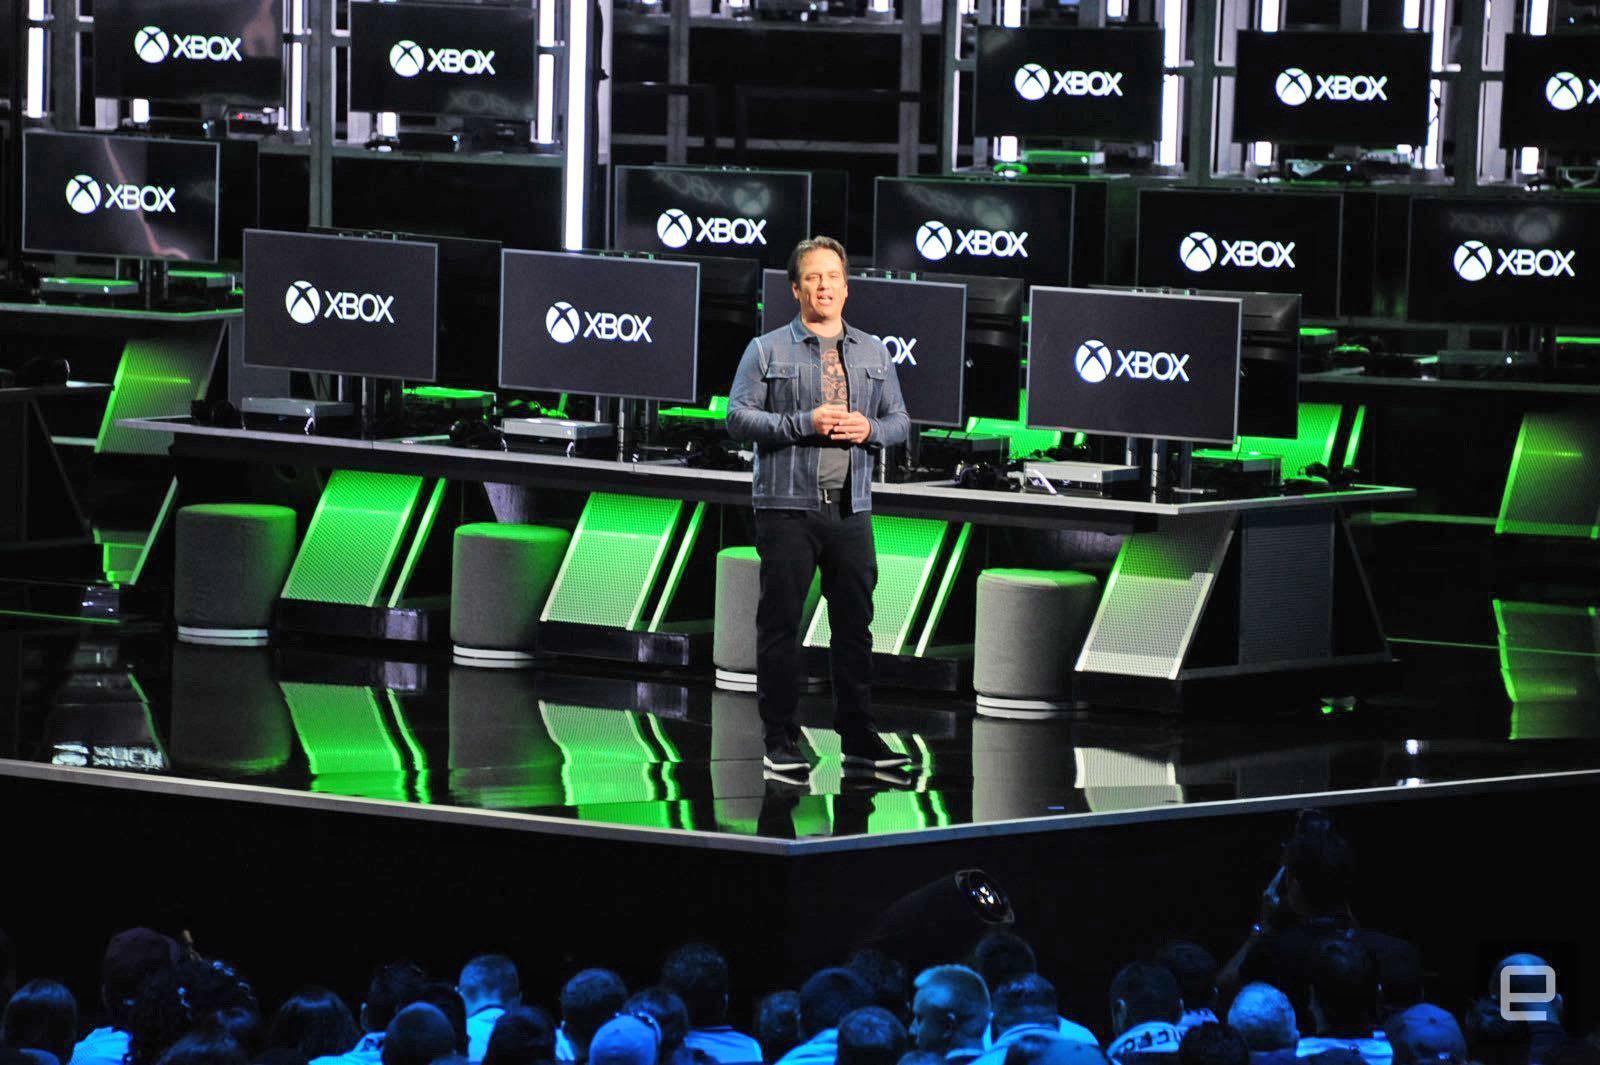 Microsoft's Xbox E3 showcase is set for June 9th